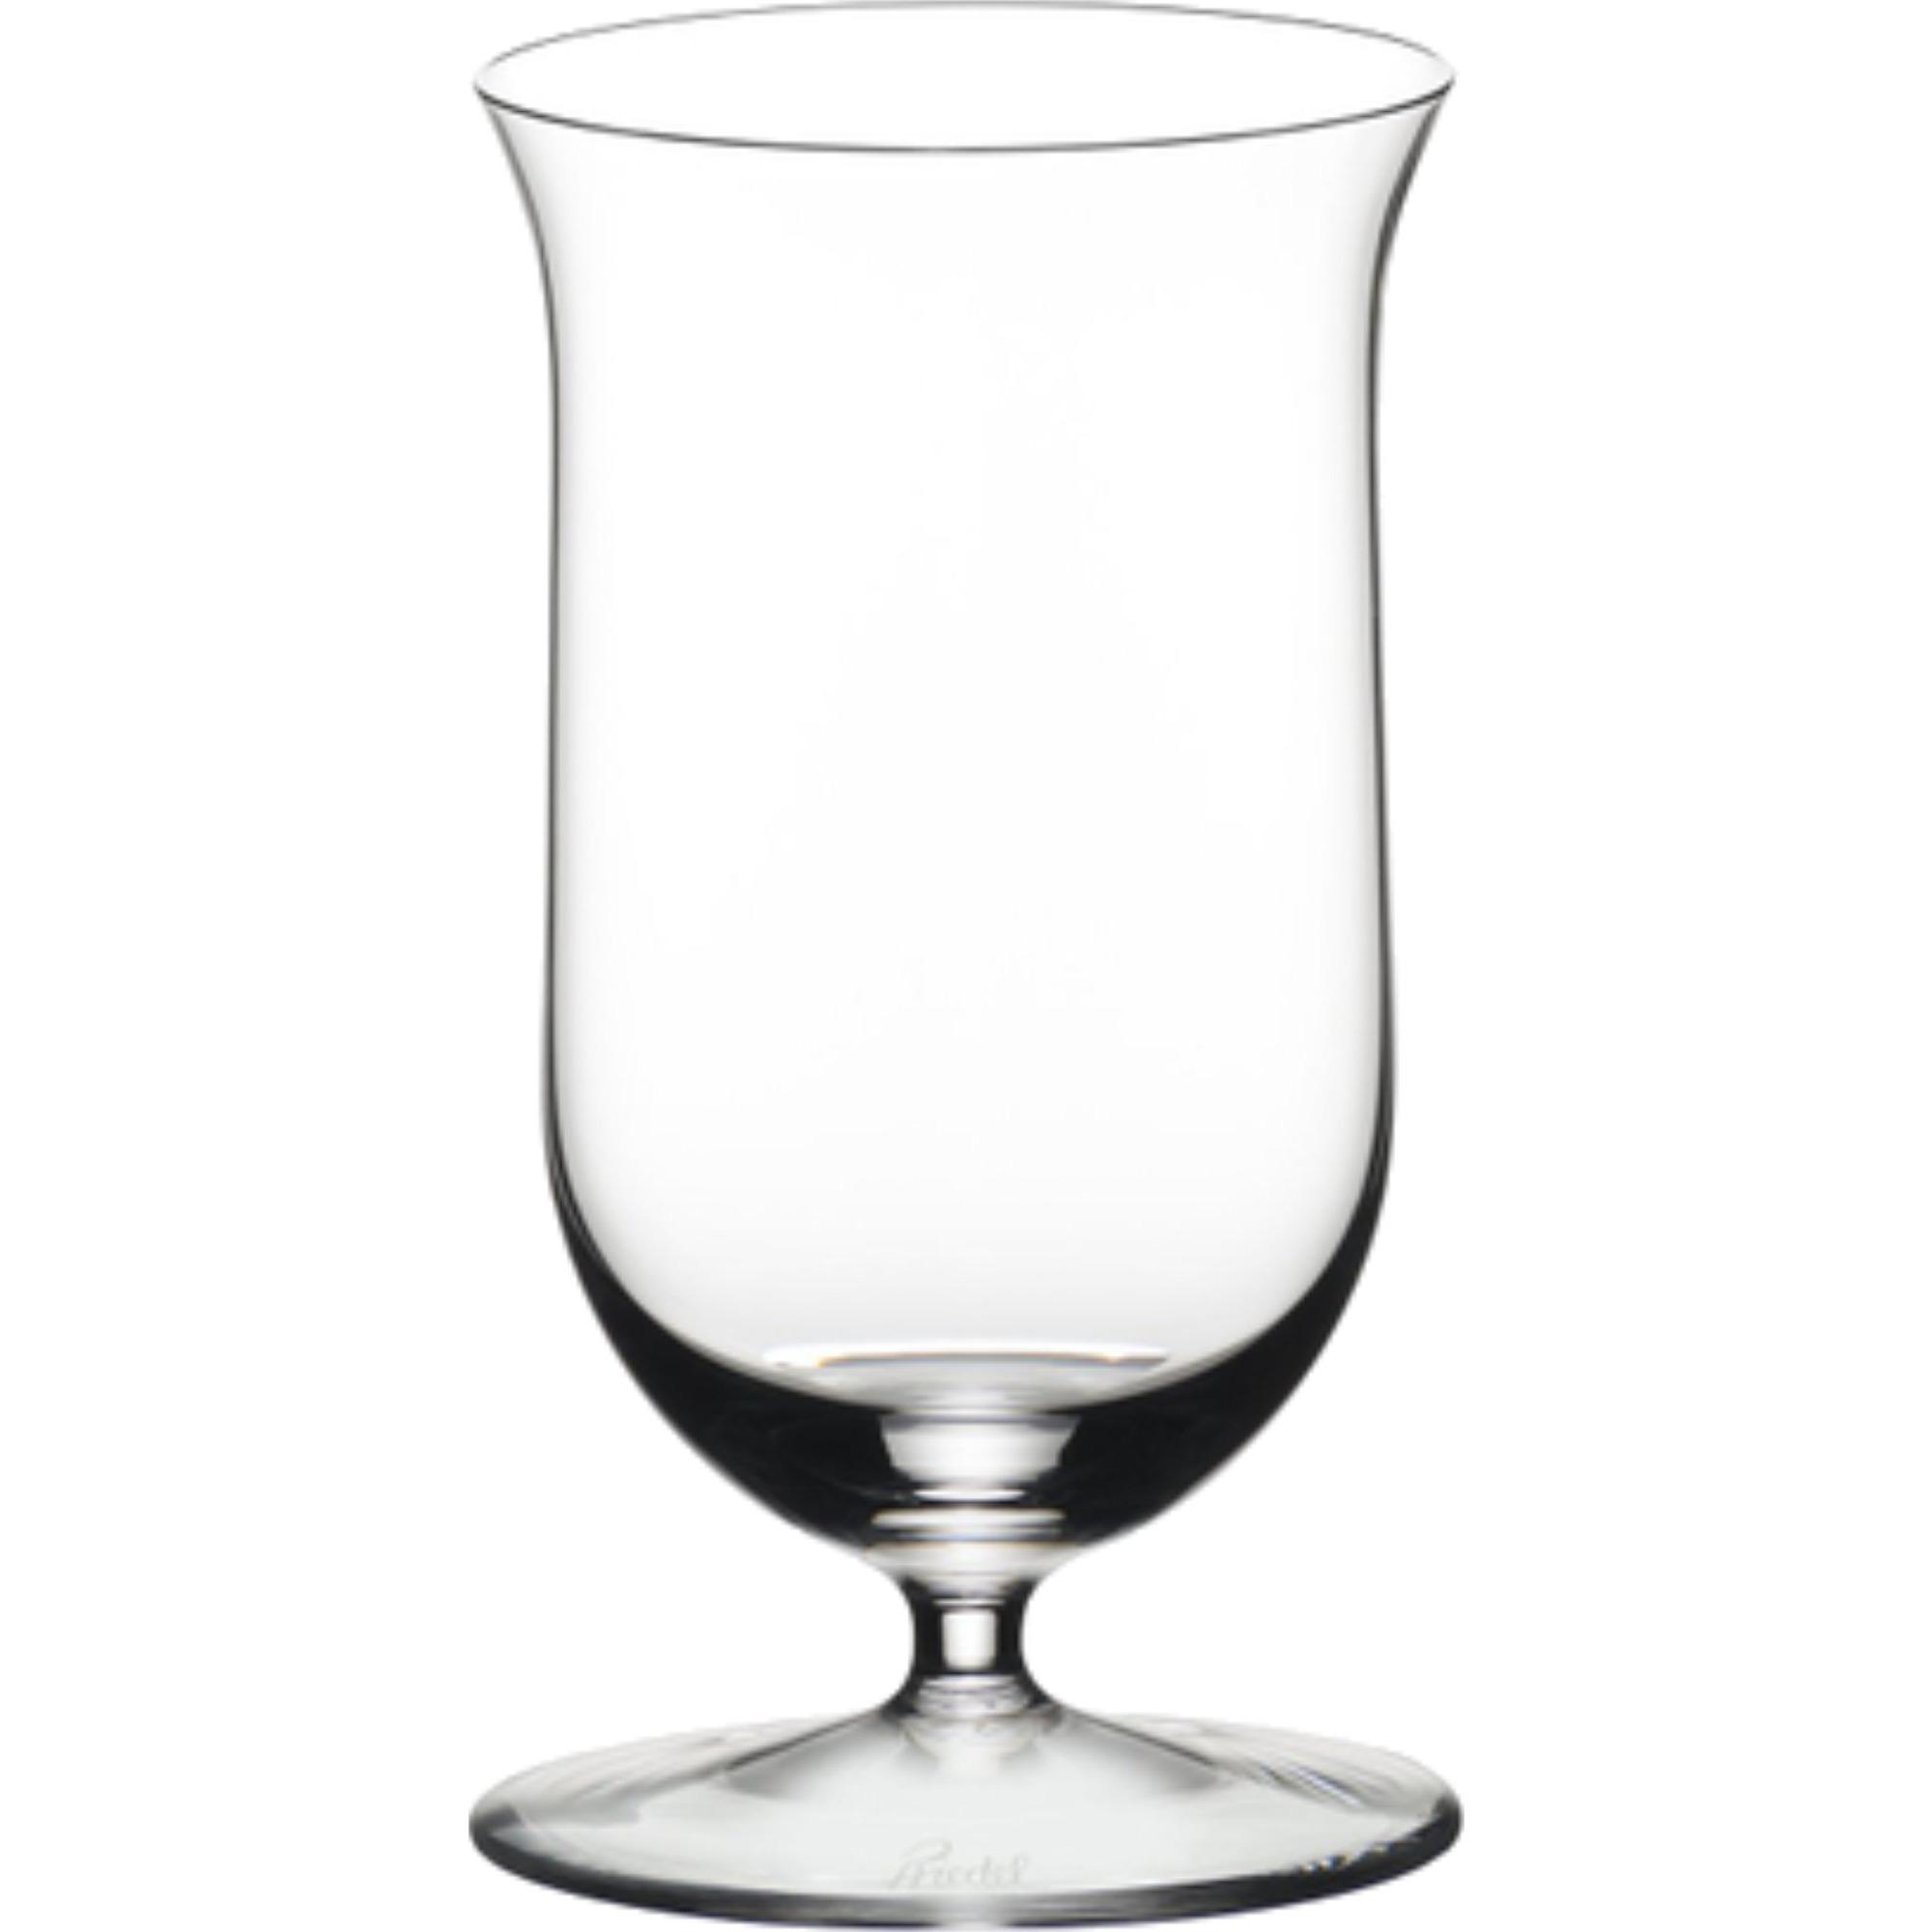 Riedel Sommelier Whiskyglas Single Malt 20 cl